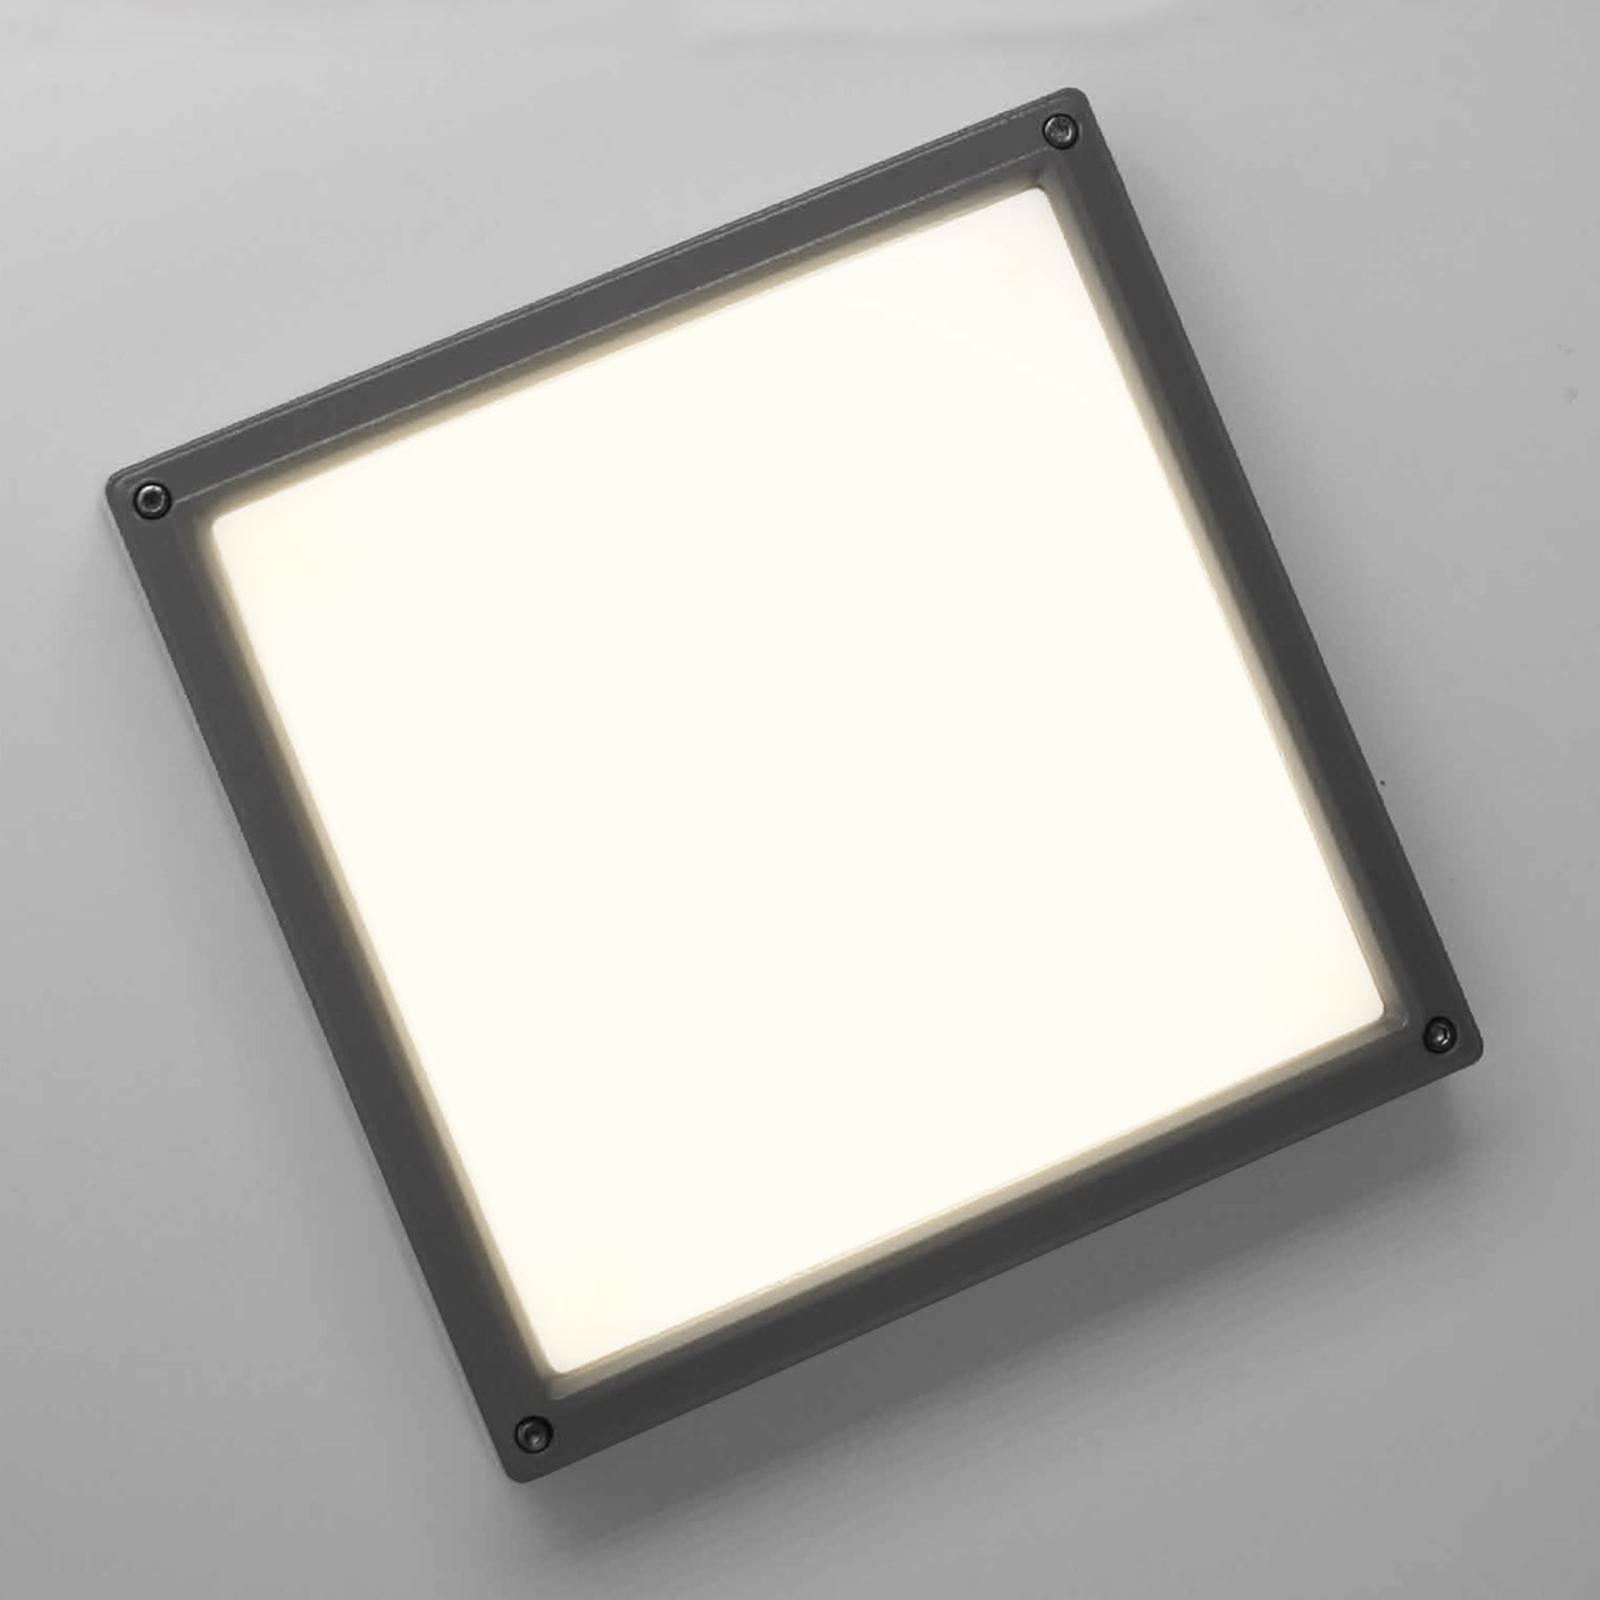 SUN 11 - LED wall light 13W_1018215_1